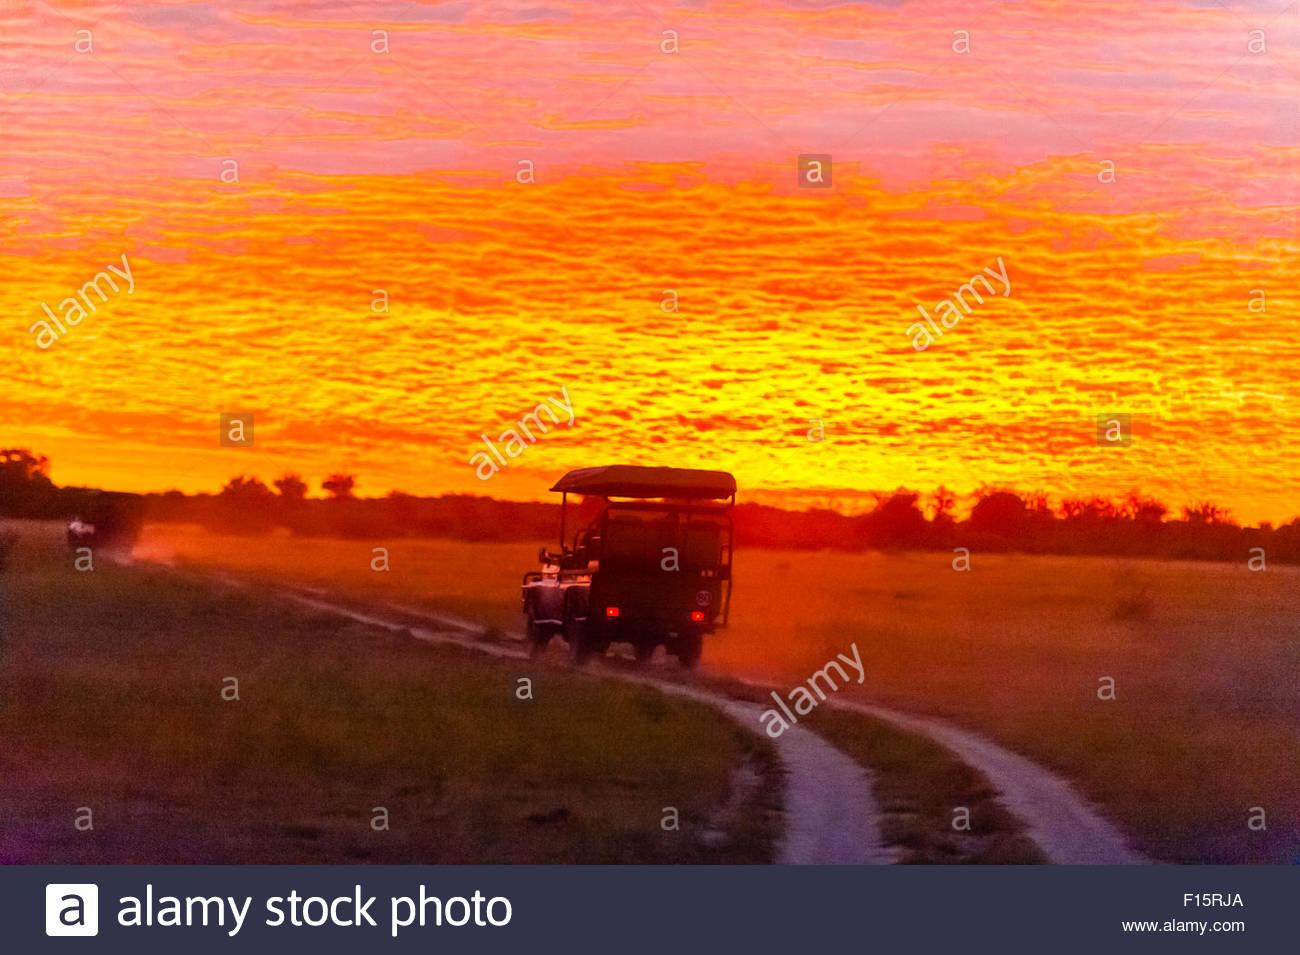 A safari vehicle starts a game drive at sunrise, Nxai Pan National Park, Botswana. - Stock Image